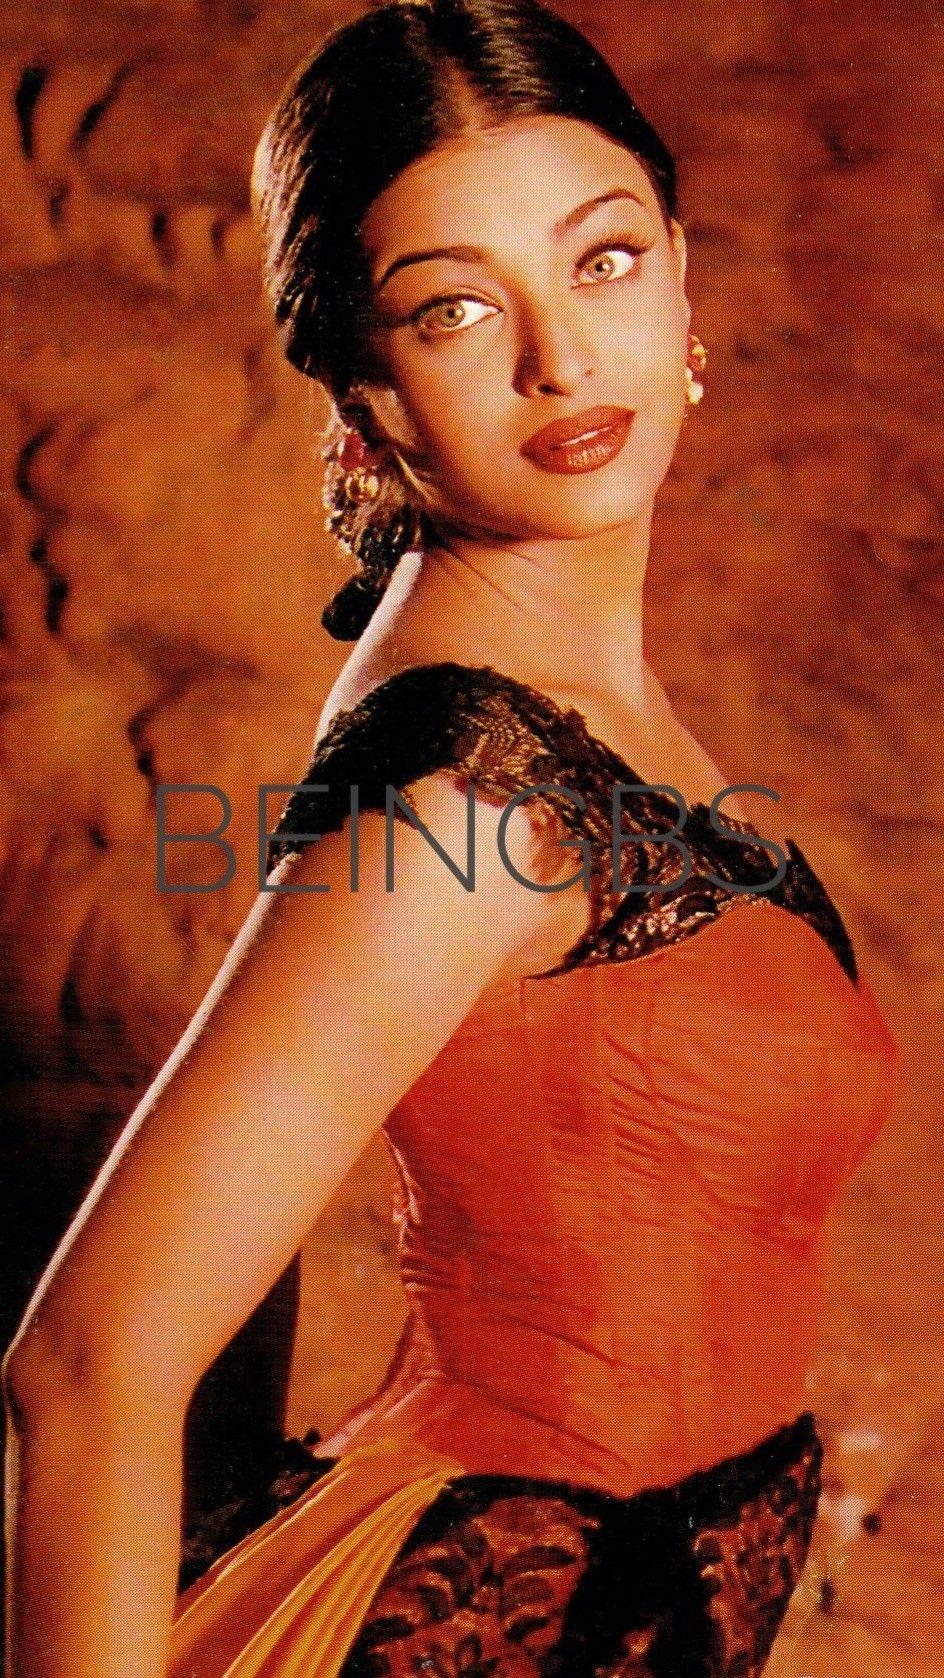 Aish Aishwarya Rai Bachchan Aishwarya Rai Young Aishwarya Rai Photo